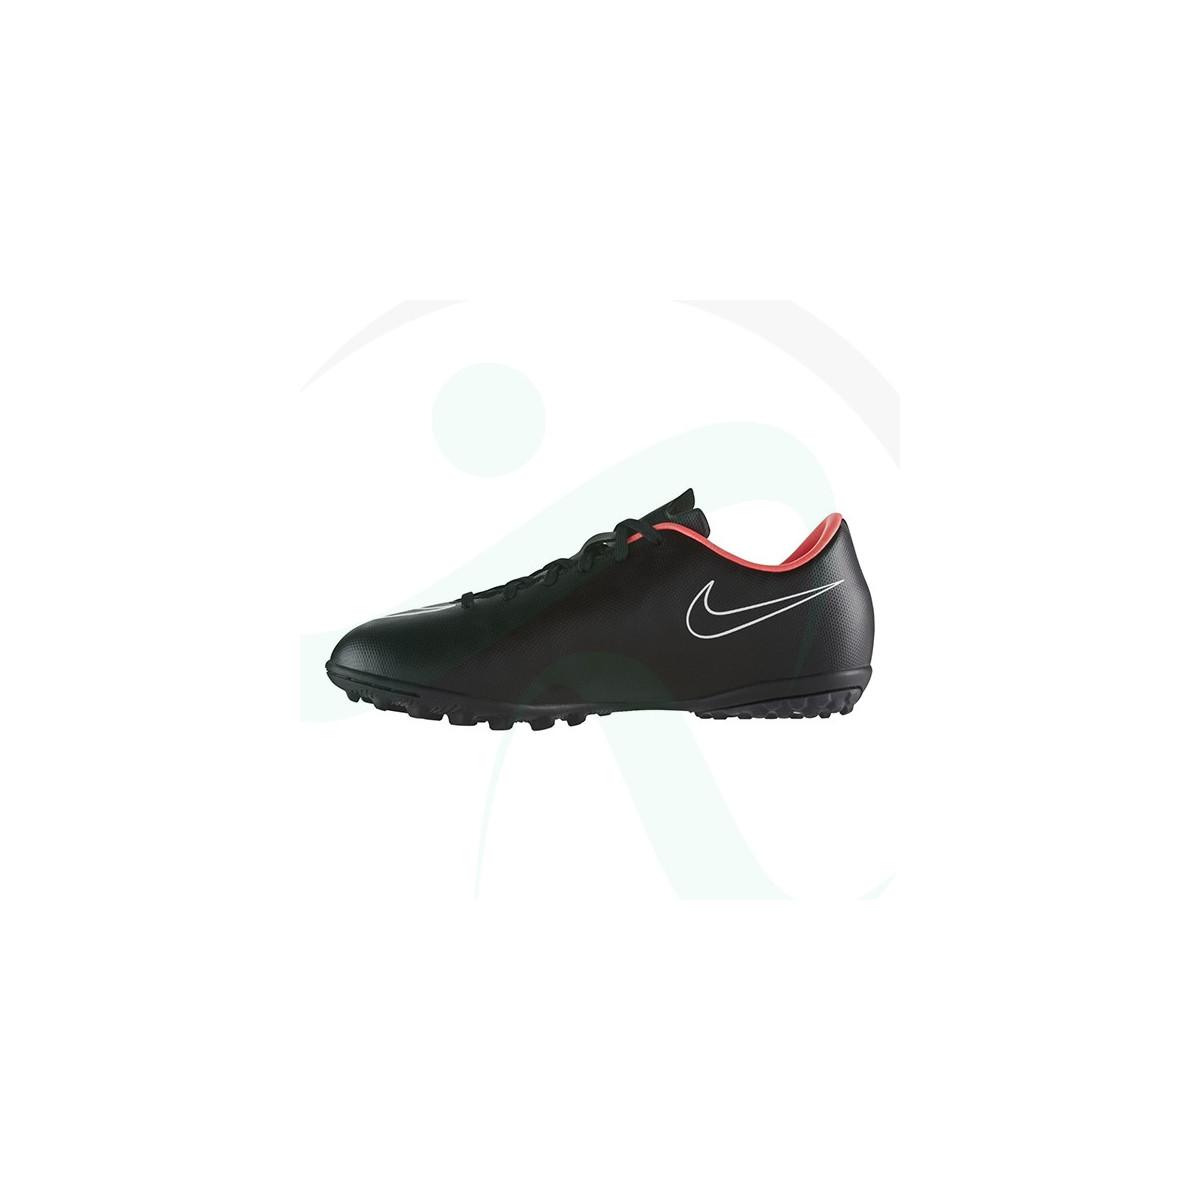 کفش استوک ریز بچهگانه نایک - آل اسپرتکفش فوتبال بچهگانه نایک مرکوریال ویکتوری 5 Nike Mercurial Victory V TF